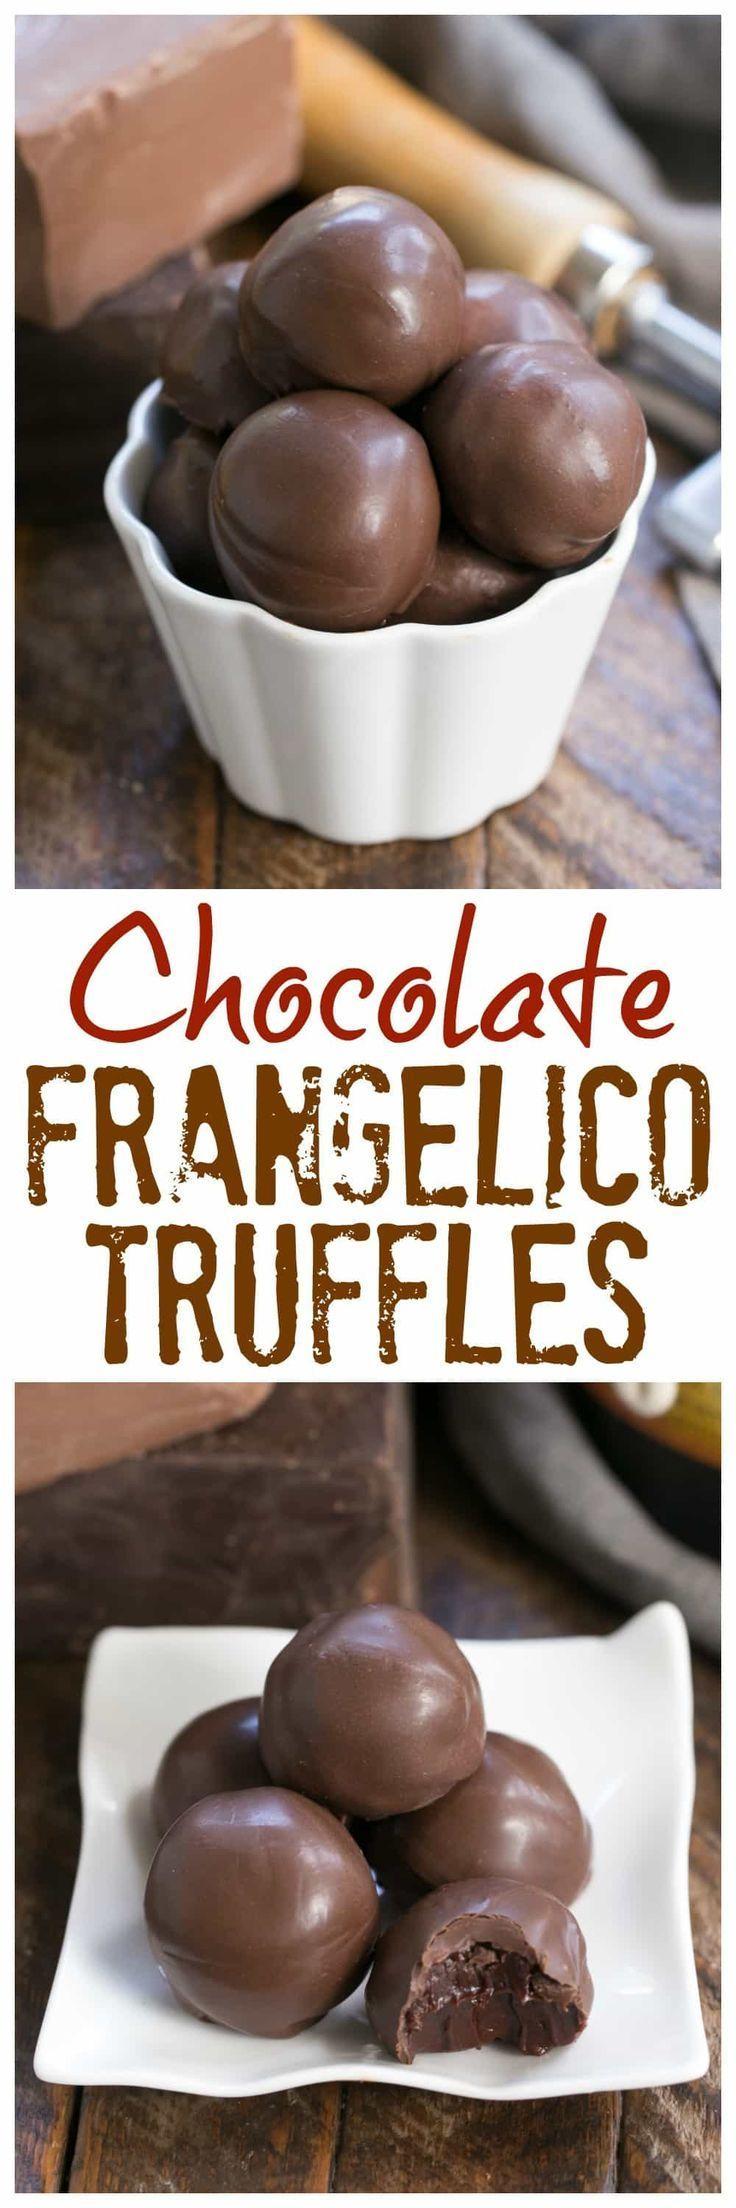 Chocolate Frangelico Truffles | Exquisite truffles flavored with hazelnut liqueur plus a guide for tempering chocolate #chocolate #truffles